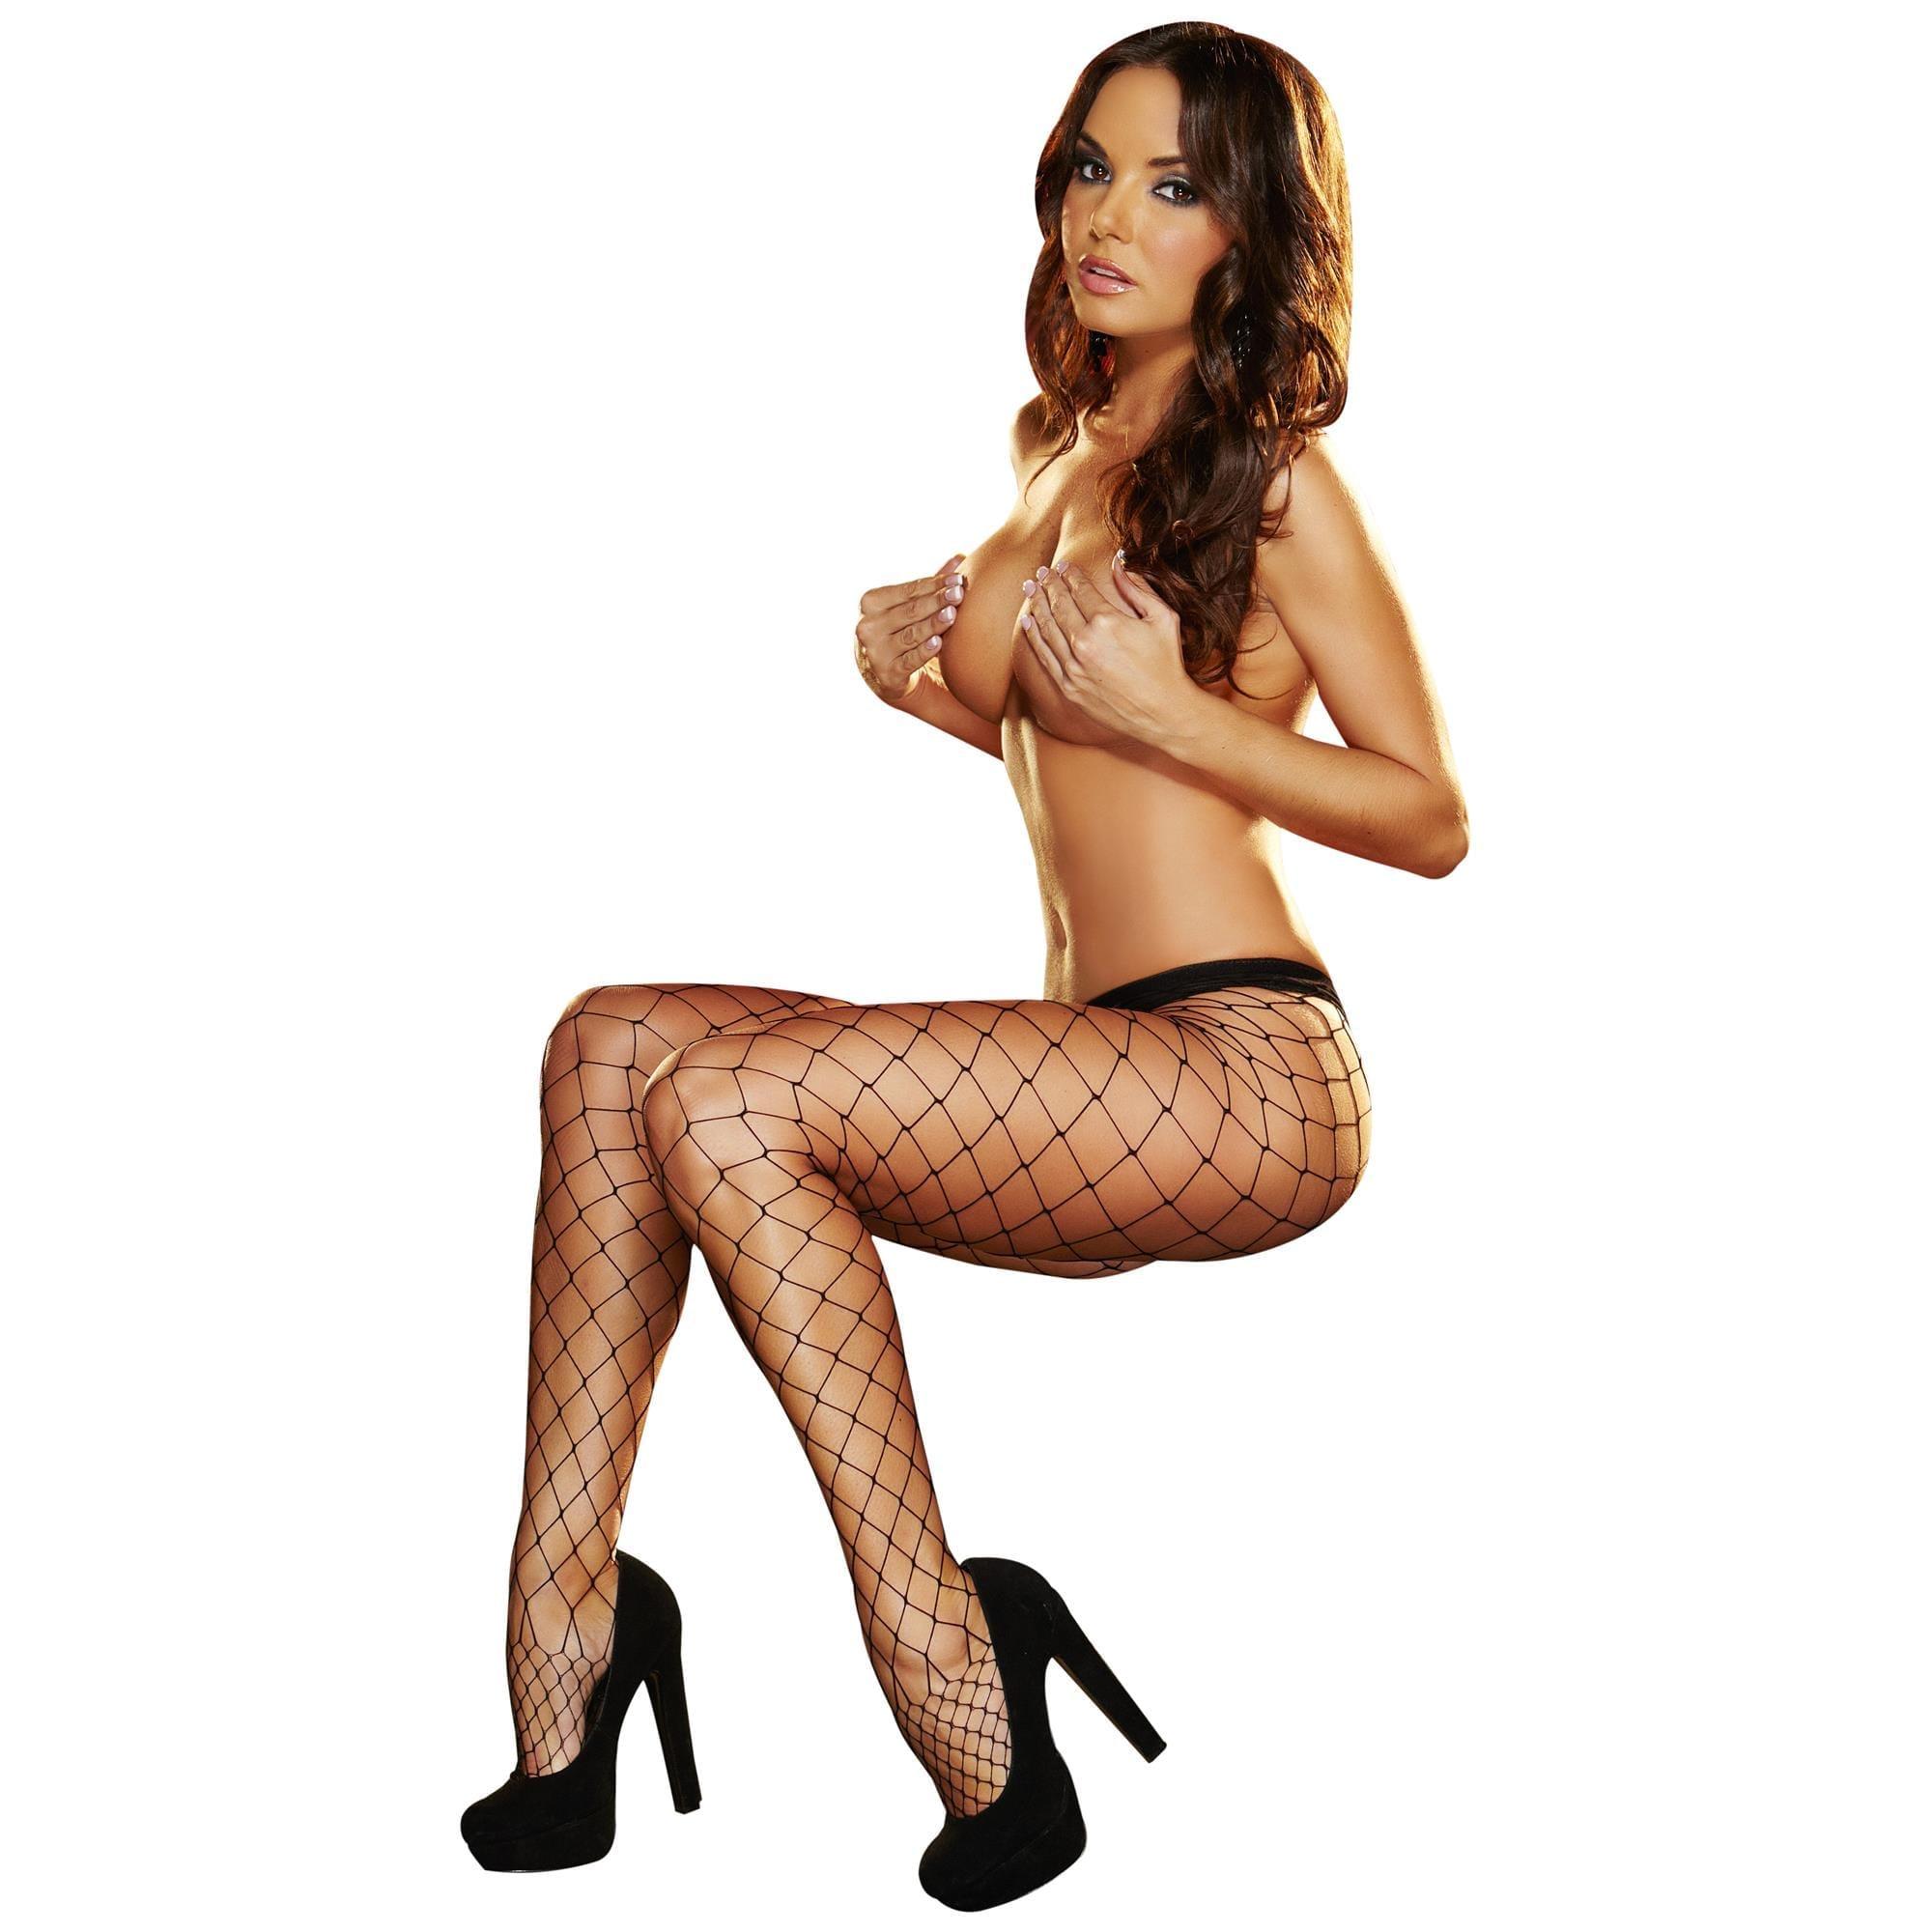 Lapdance - Big Net Pantyhose Black | Sexiga Underkläder, Strumpbyxor & Stay-ups | Intimast.se - Sexleksaker